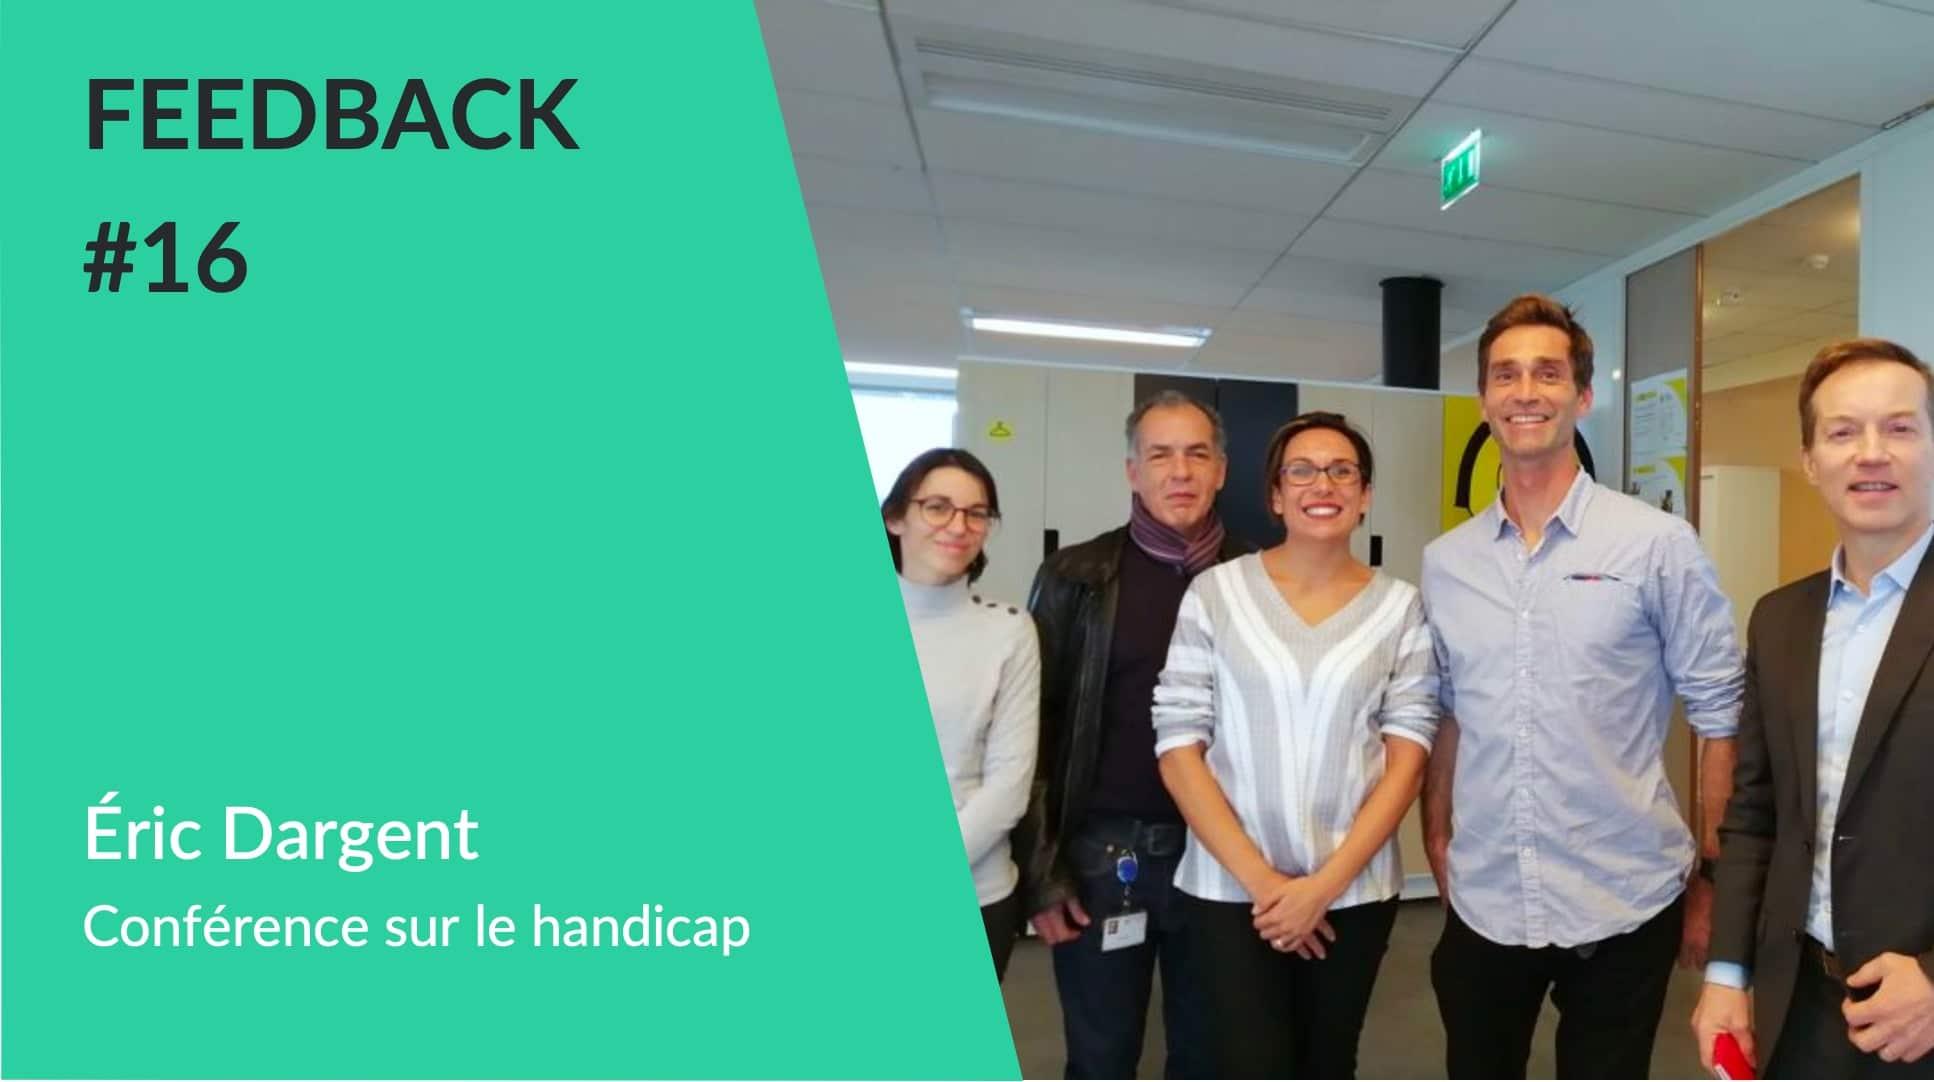 Conférence Handicap Air Liquide avec Cyril Moré - Feedback